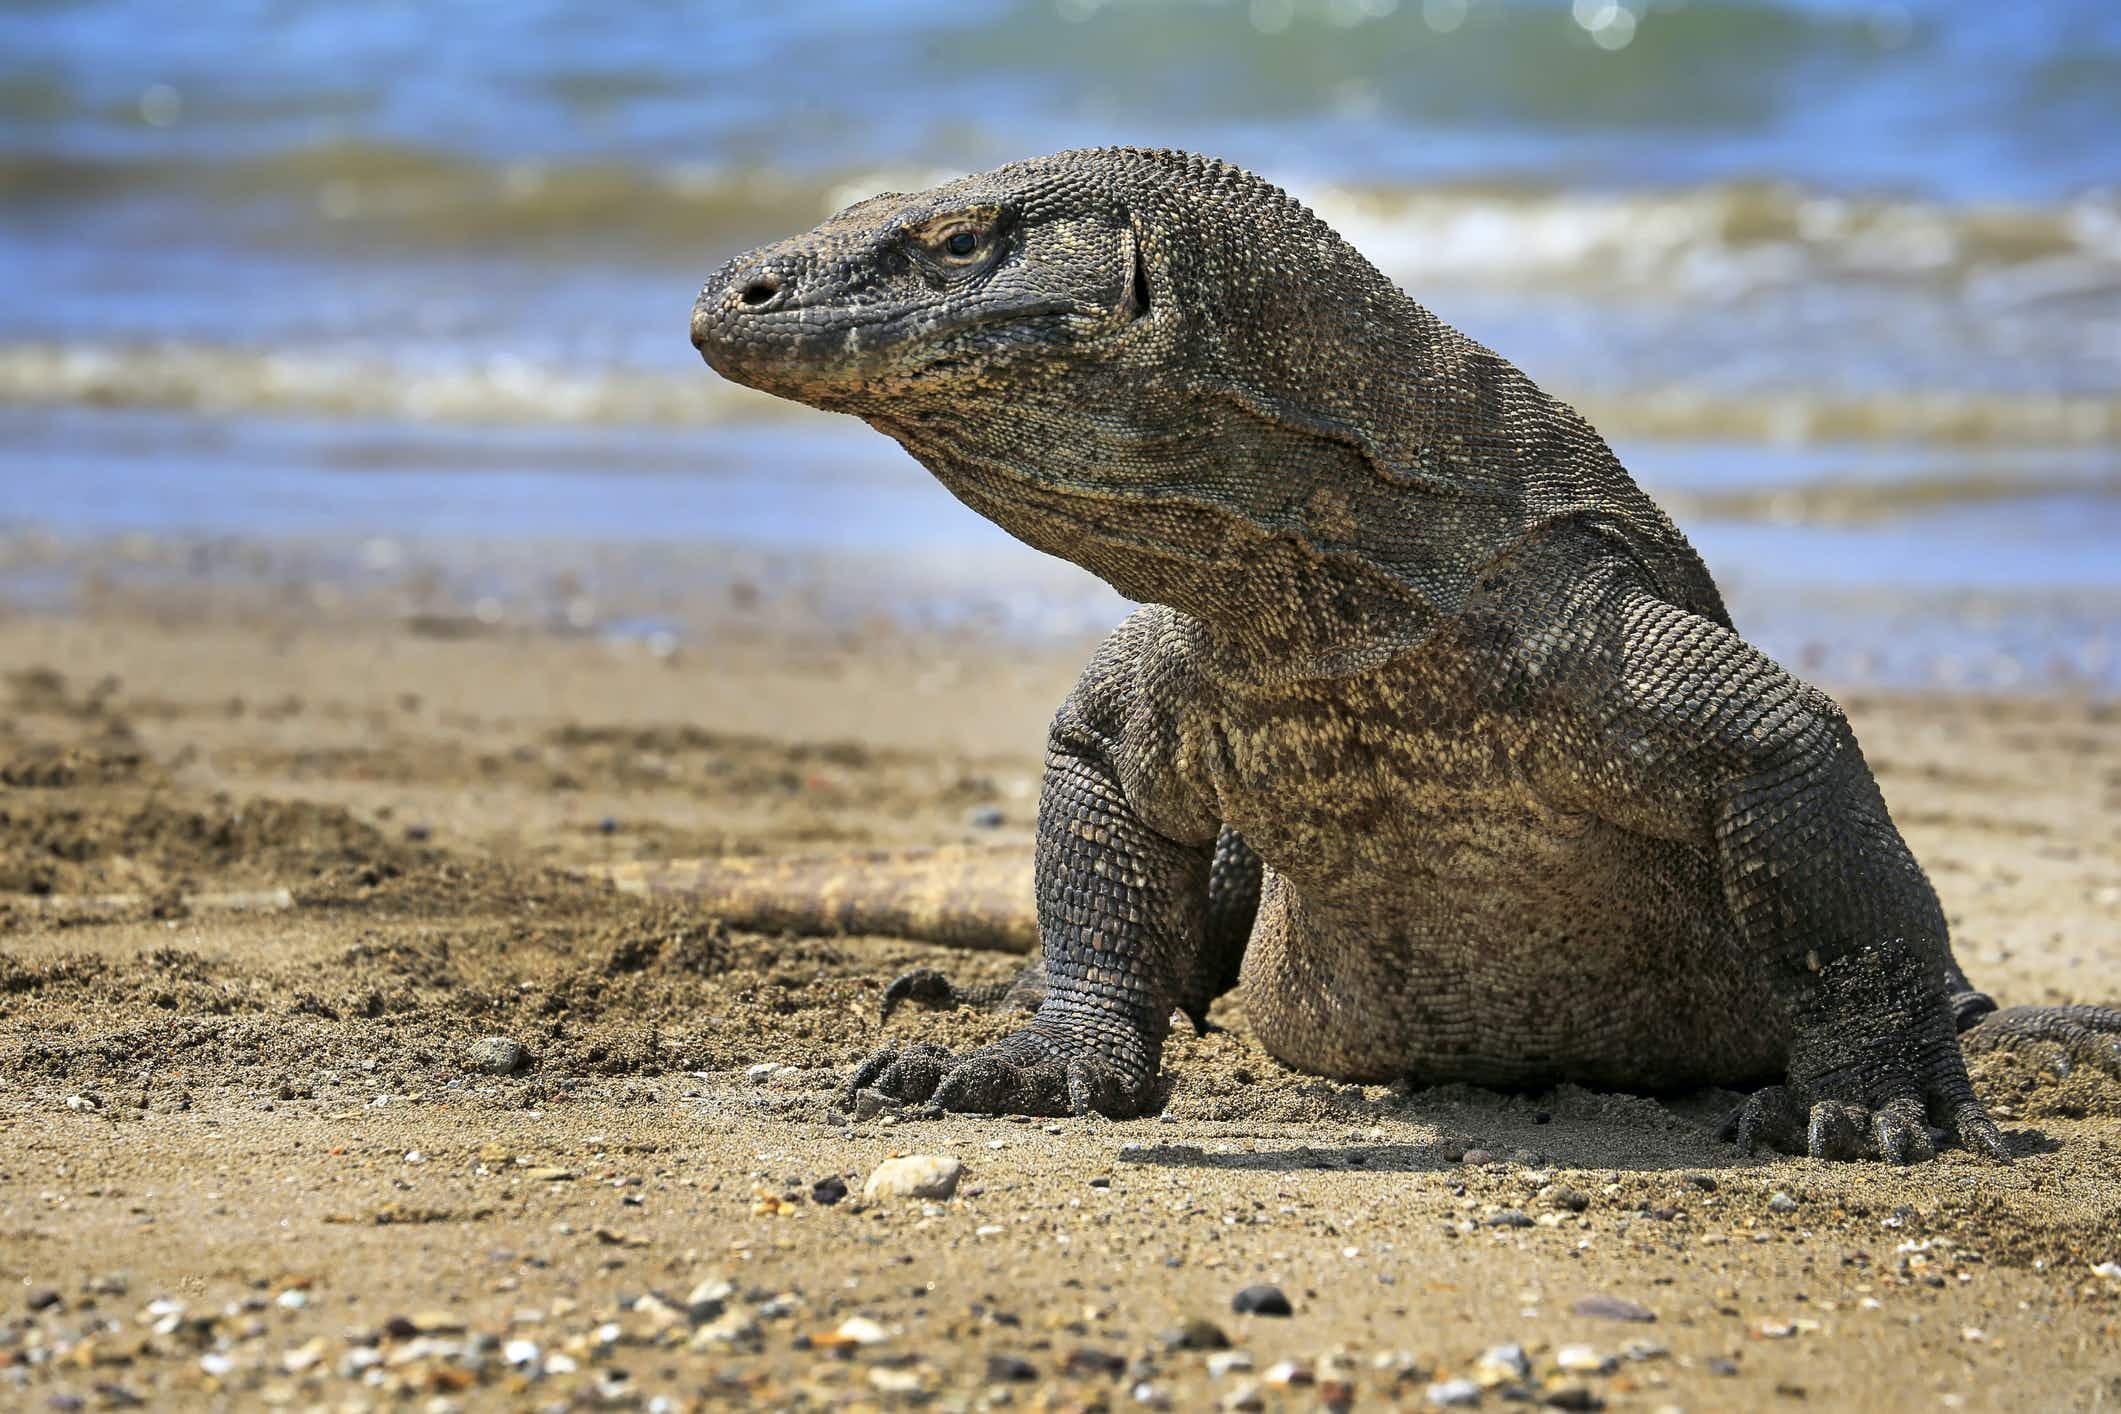 Visitors to Komodo Island may have to pay an annual membership fee ©jeffysurianto via Getty